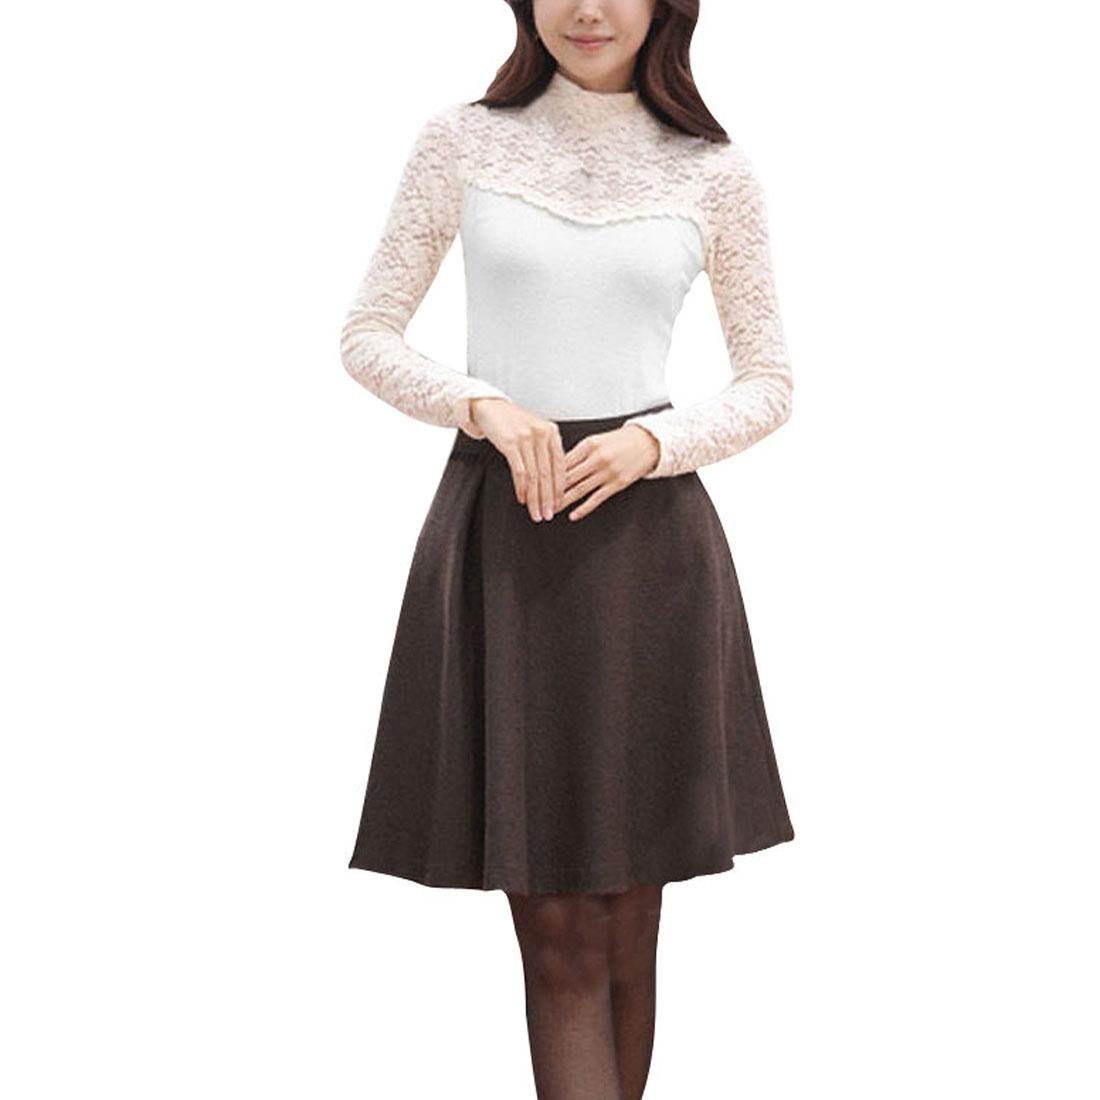 Ladies White Turtle Neck Pullover Stylish Lace Panel Shirt XS